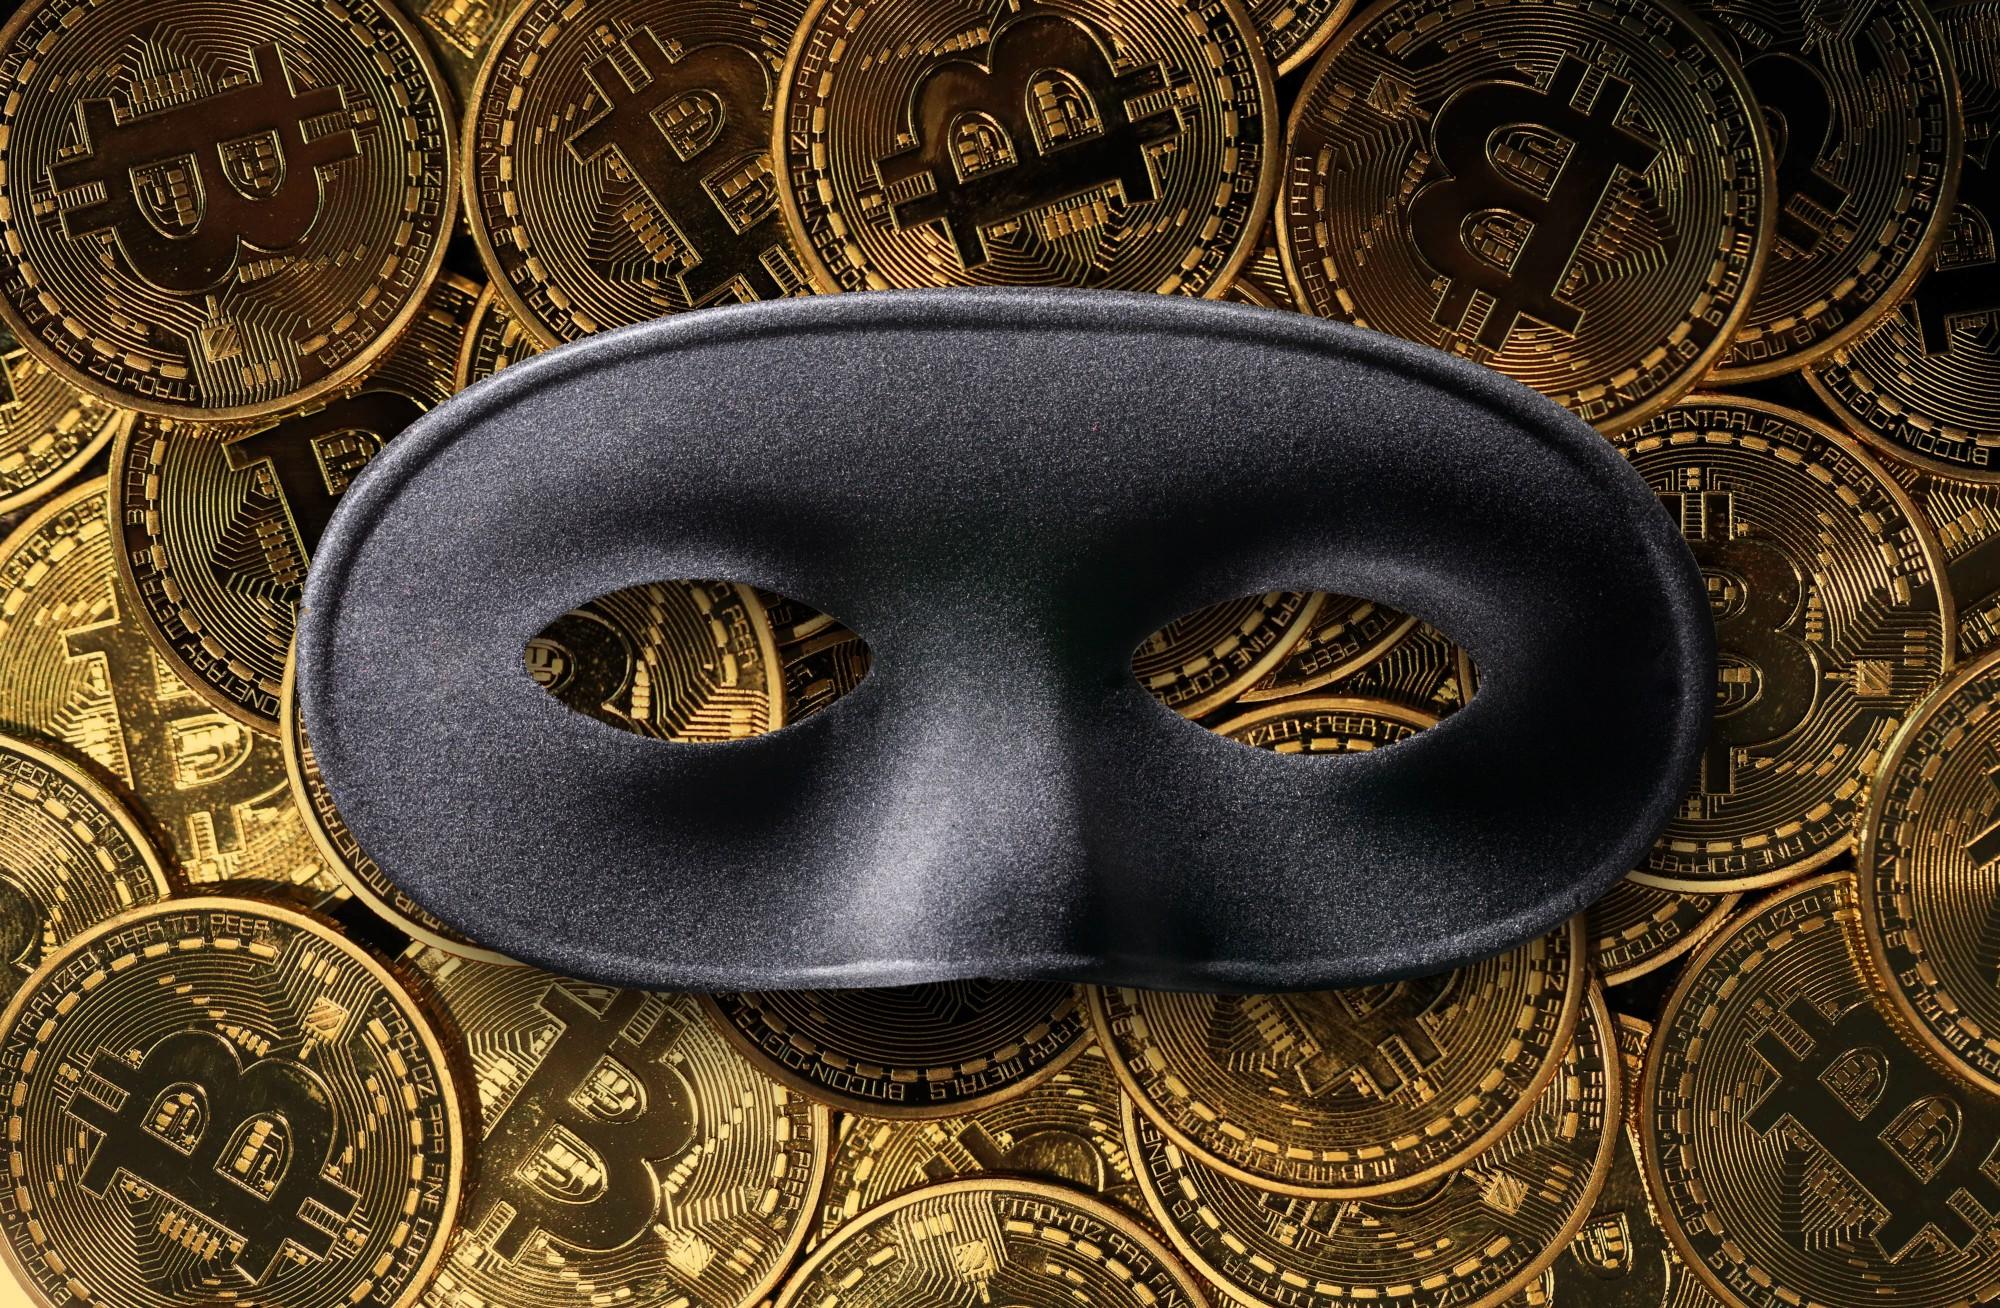 факторы роста курса биткоина